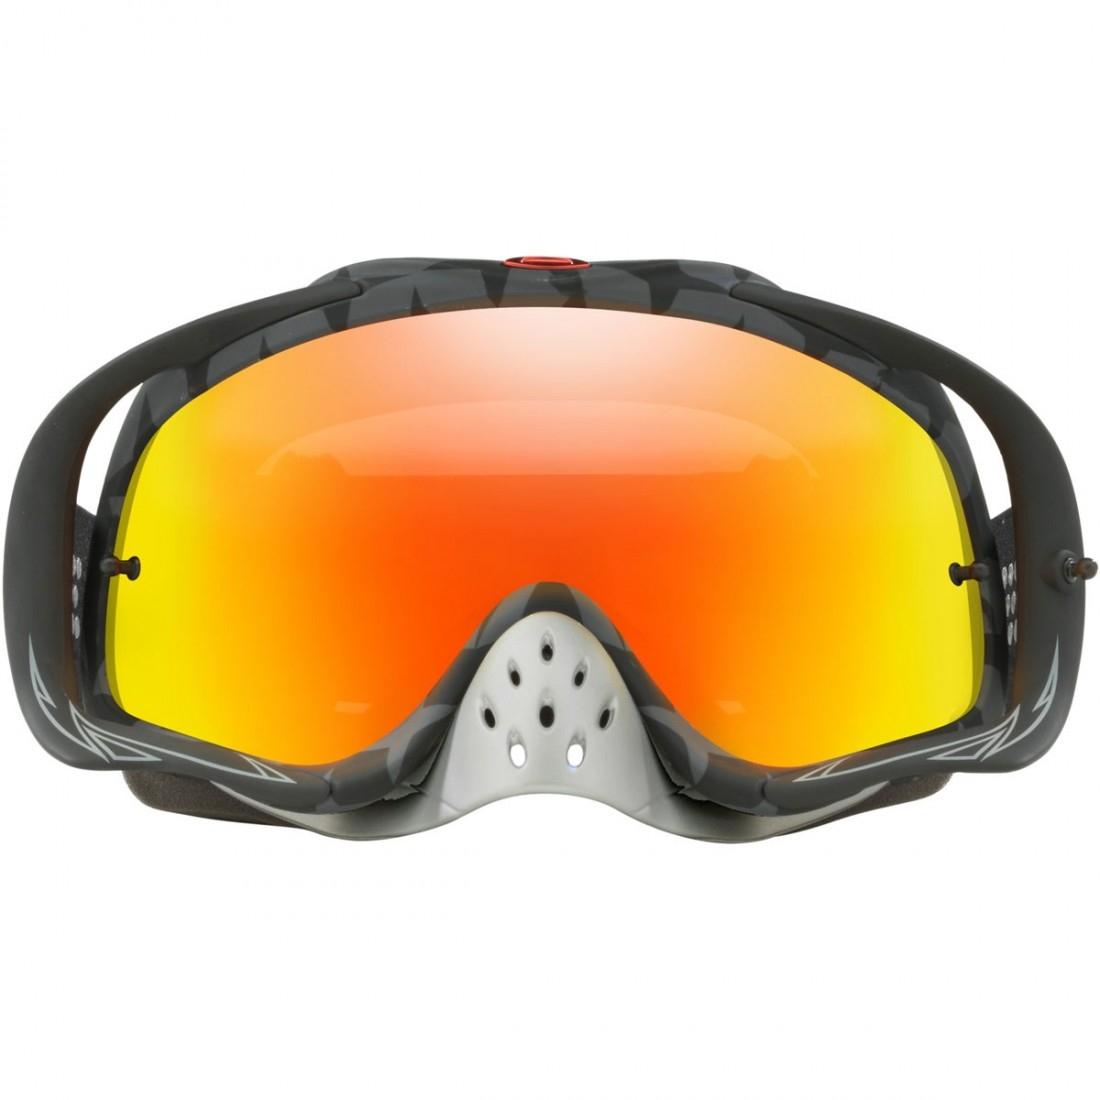 024cf499465 OAKLEY Crowbar MX Troy Lee Designs Series Megaburst Black   Fire Iridium  Goggles